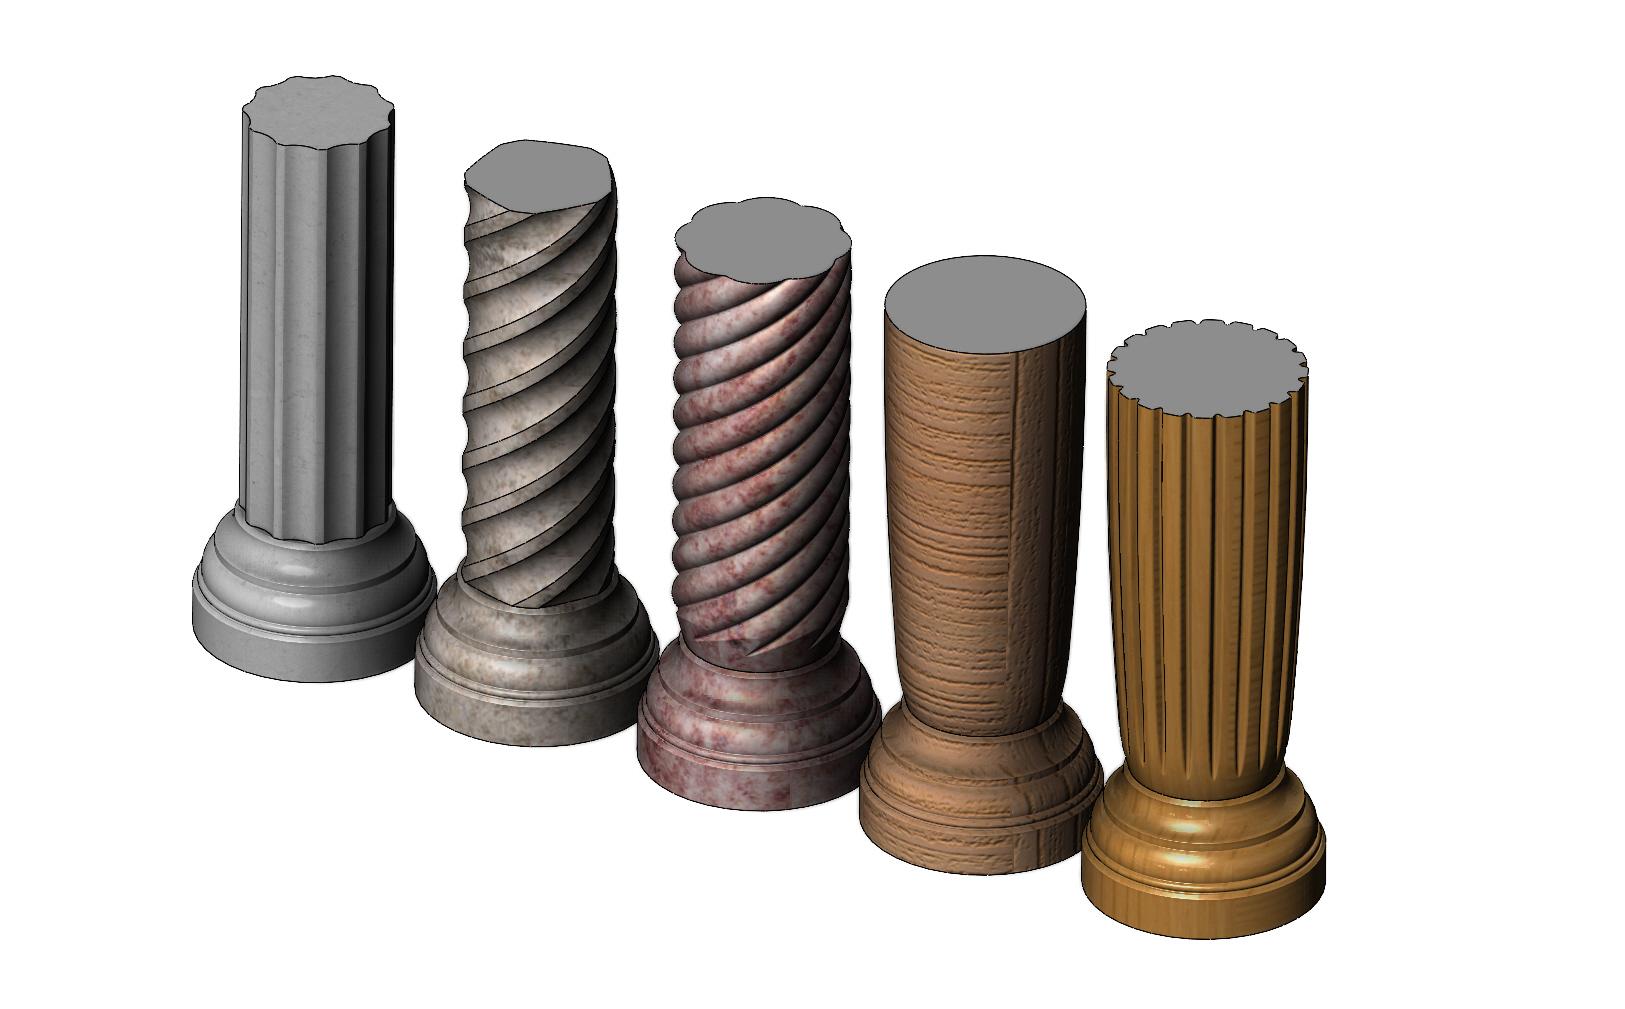 columns-mini-02.JPG Download 3MF file Miniature model making columns 3D print model • 3D printable design, RachidSW